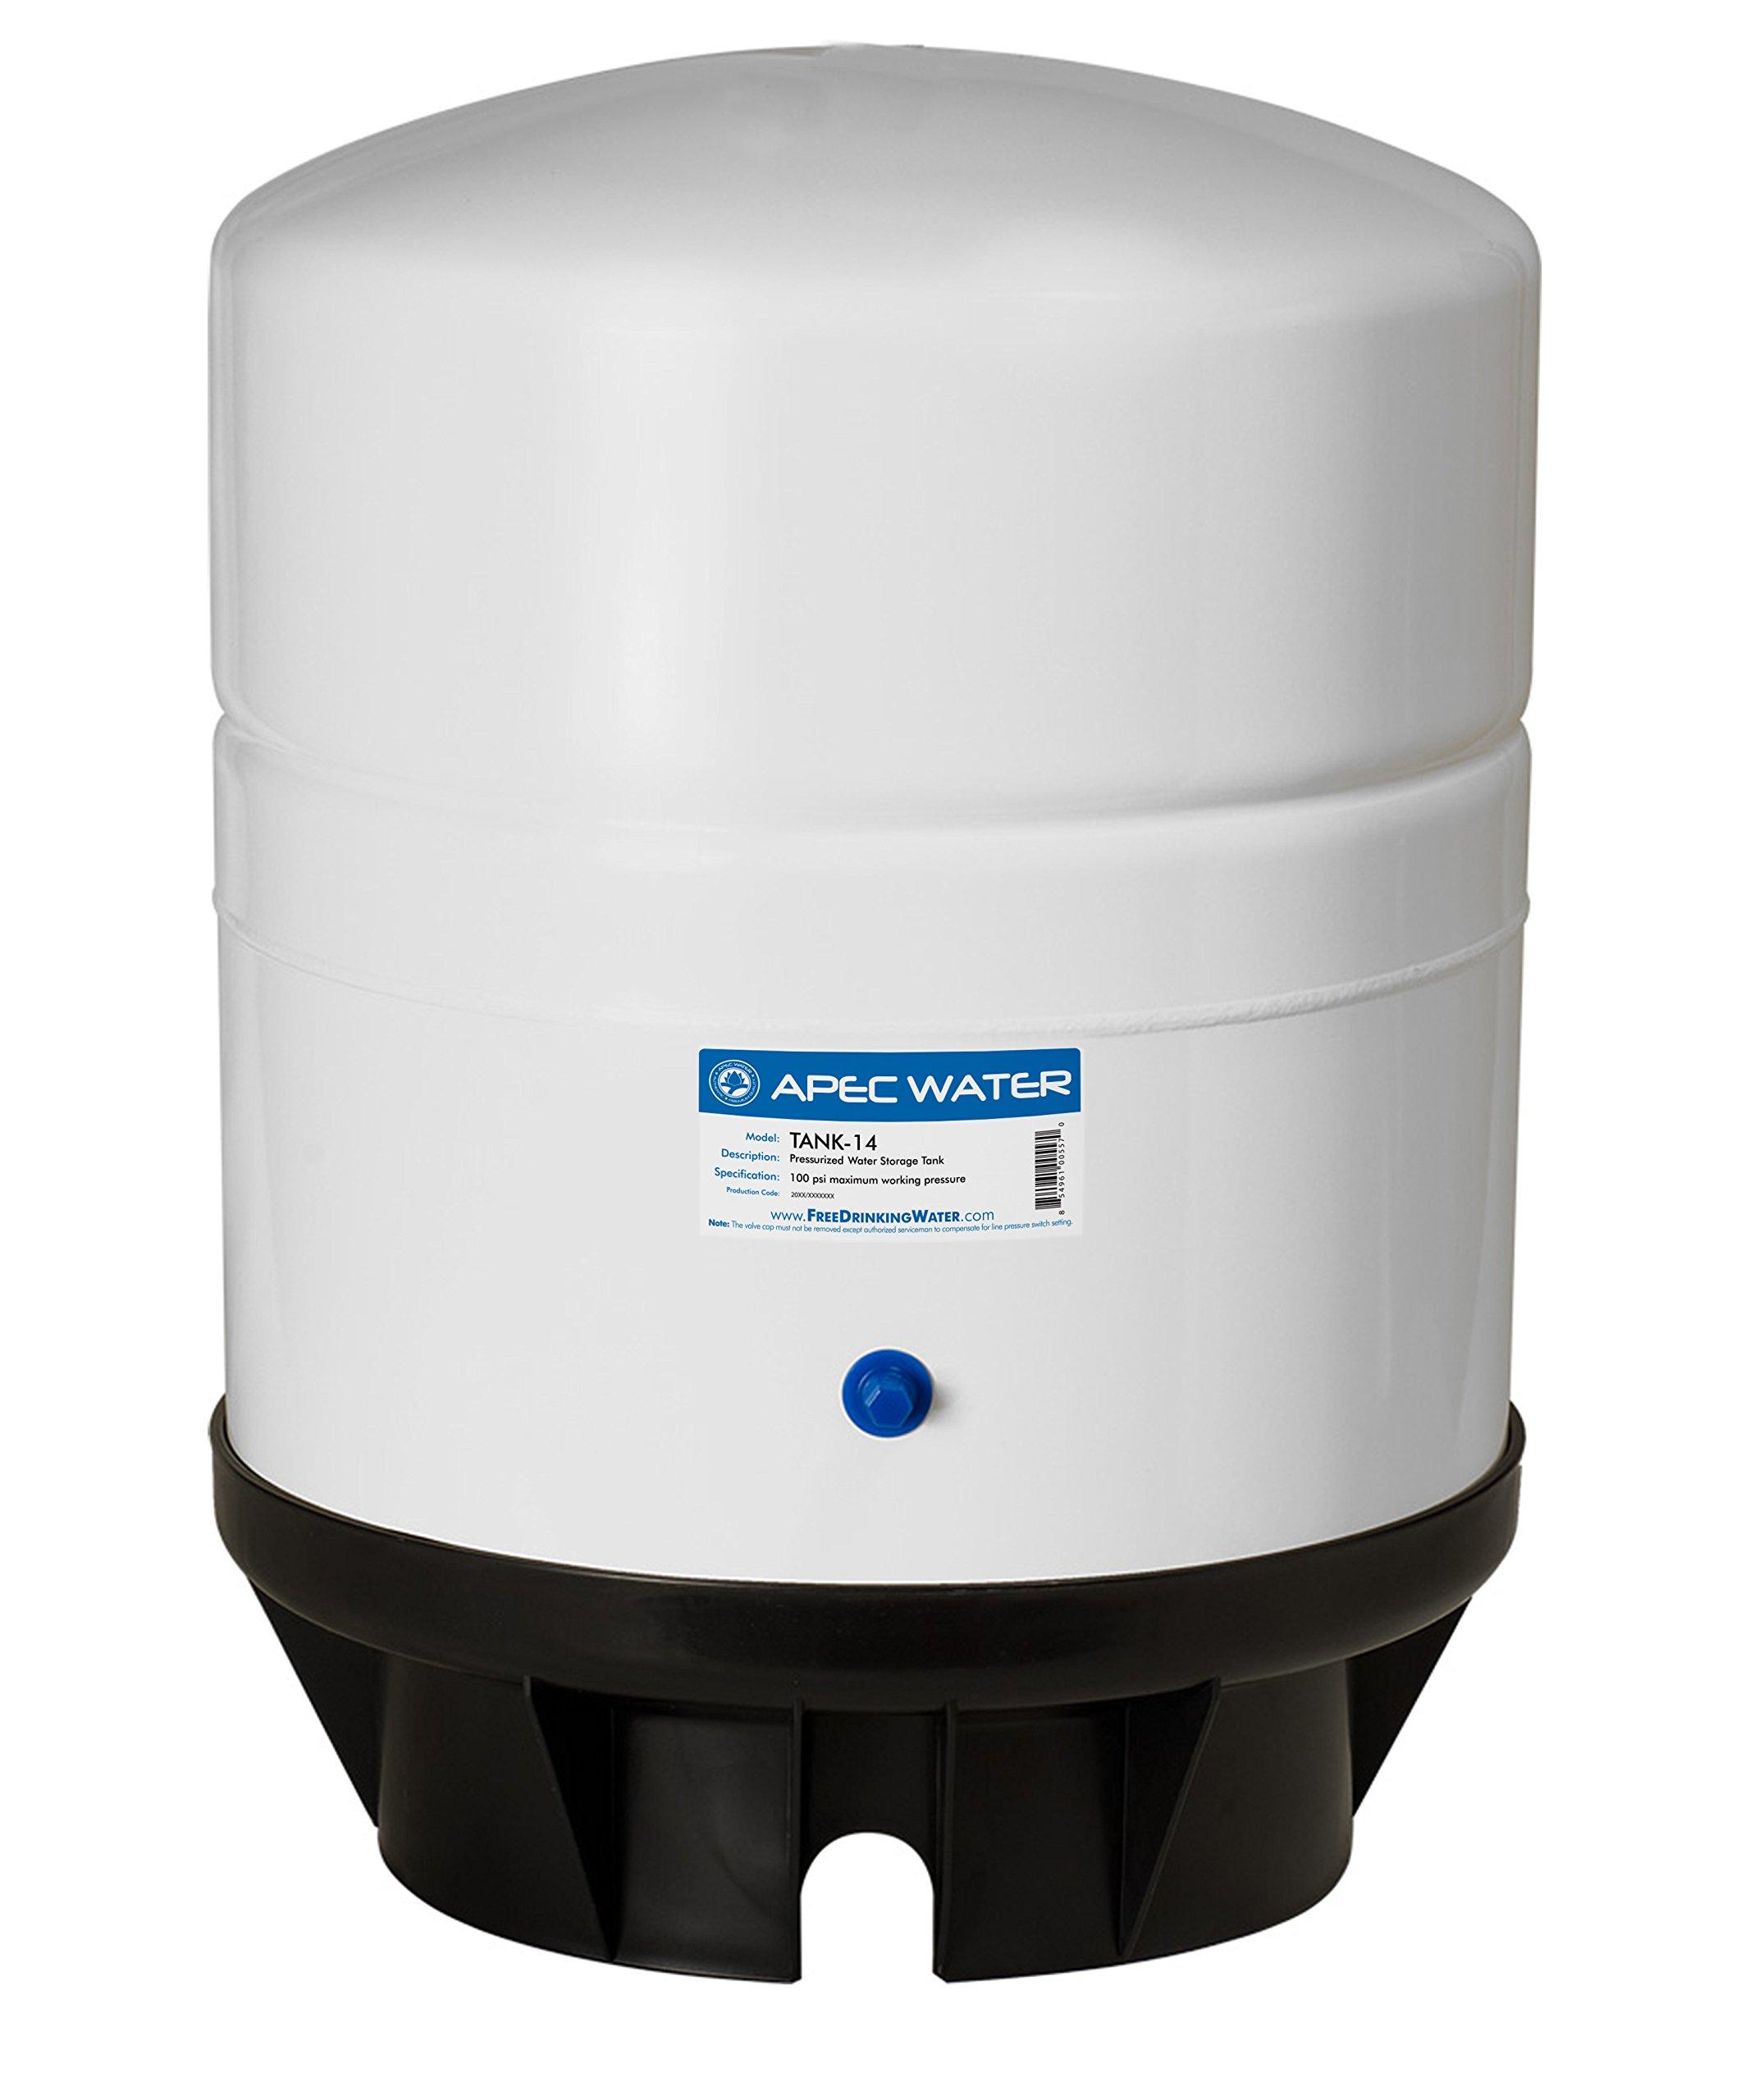 APEC TANK-14 14 Gallon Pre-Pressurized Reverse Osmosis Water Storage Tank